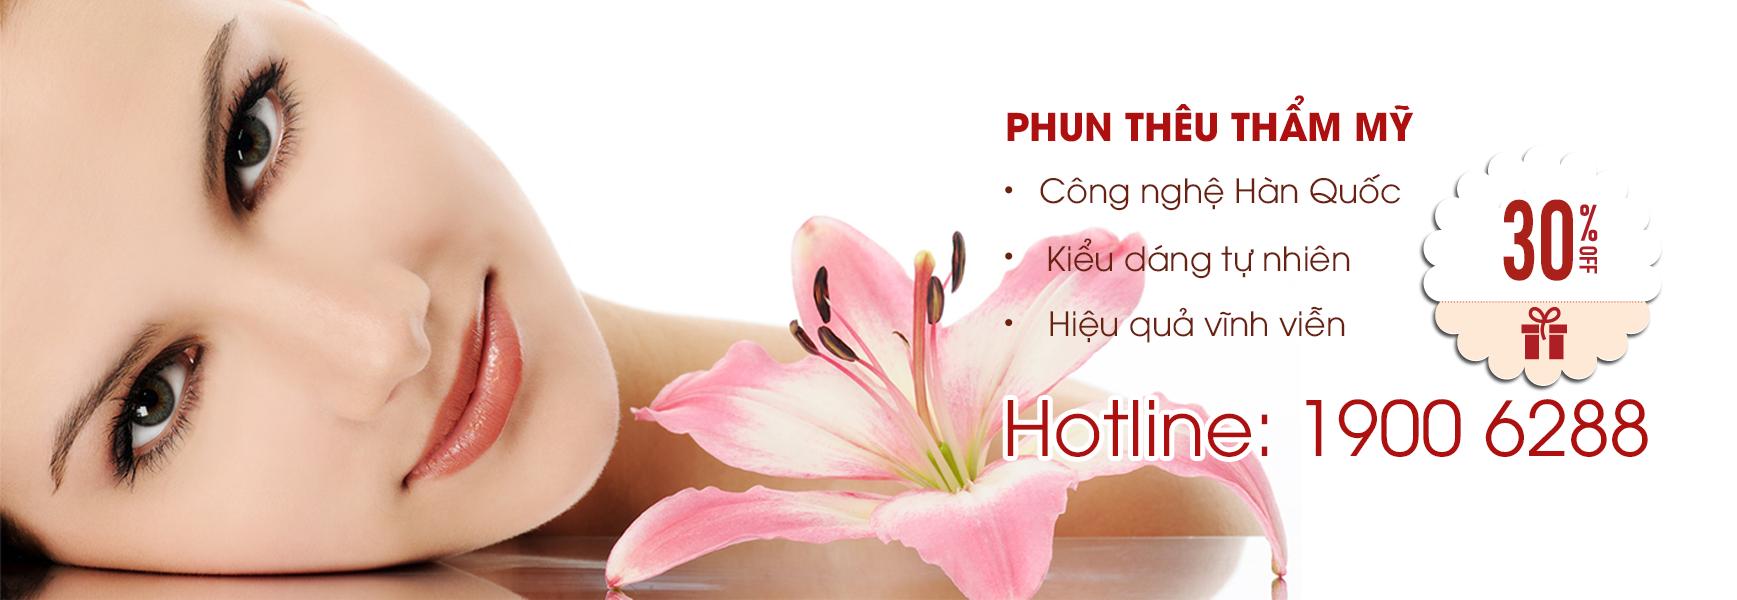 banner-phun-theu-web